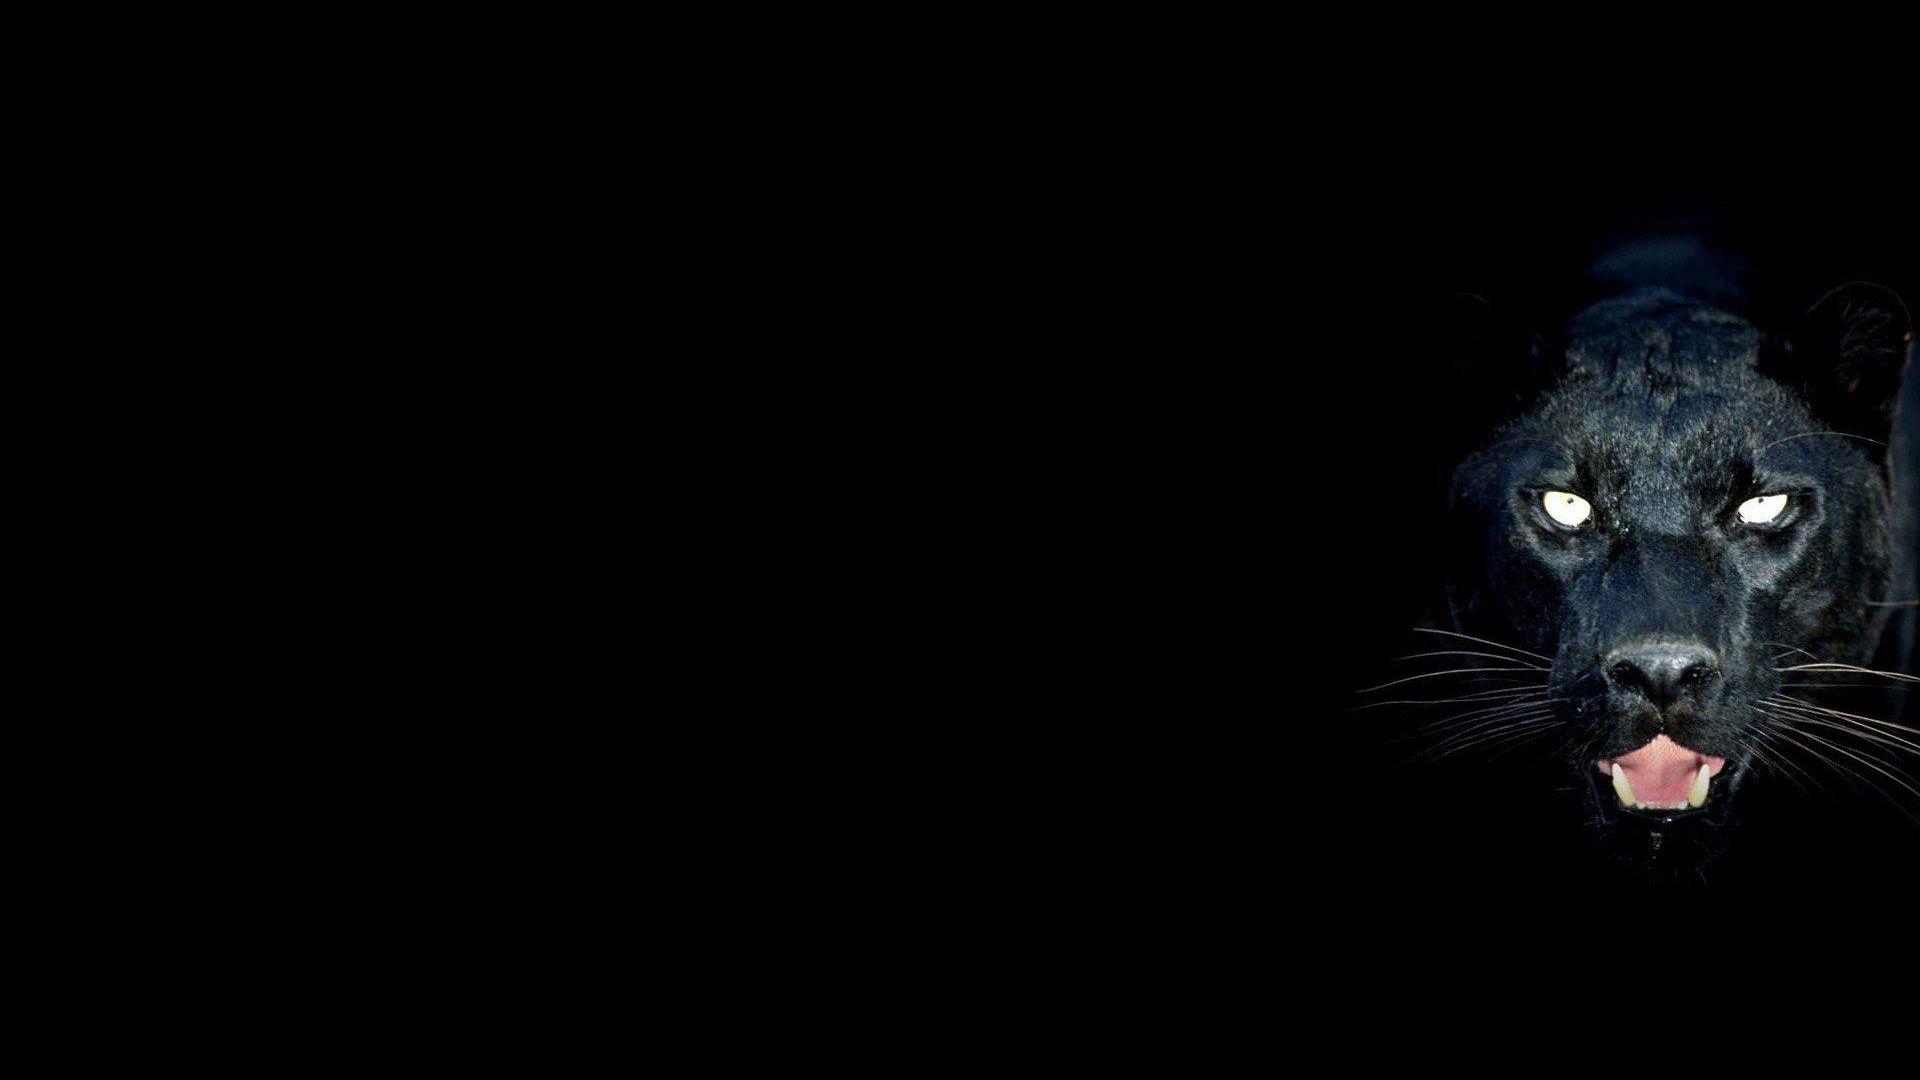 Http Rontalk Com Wp Content Uploads Black Jaguar Animal Wallpaper Widescren Jpg Black Panther Hd Wallpaper Jaguar Animal Black Panther Images